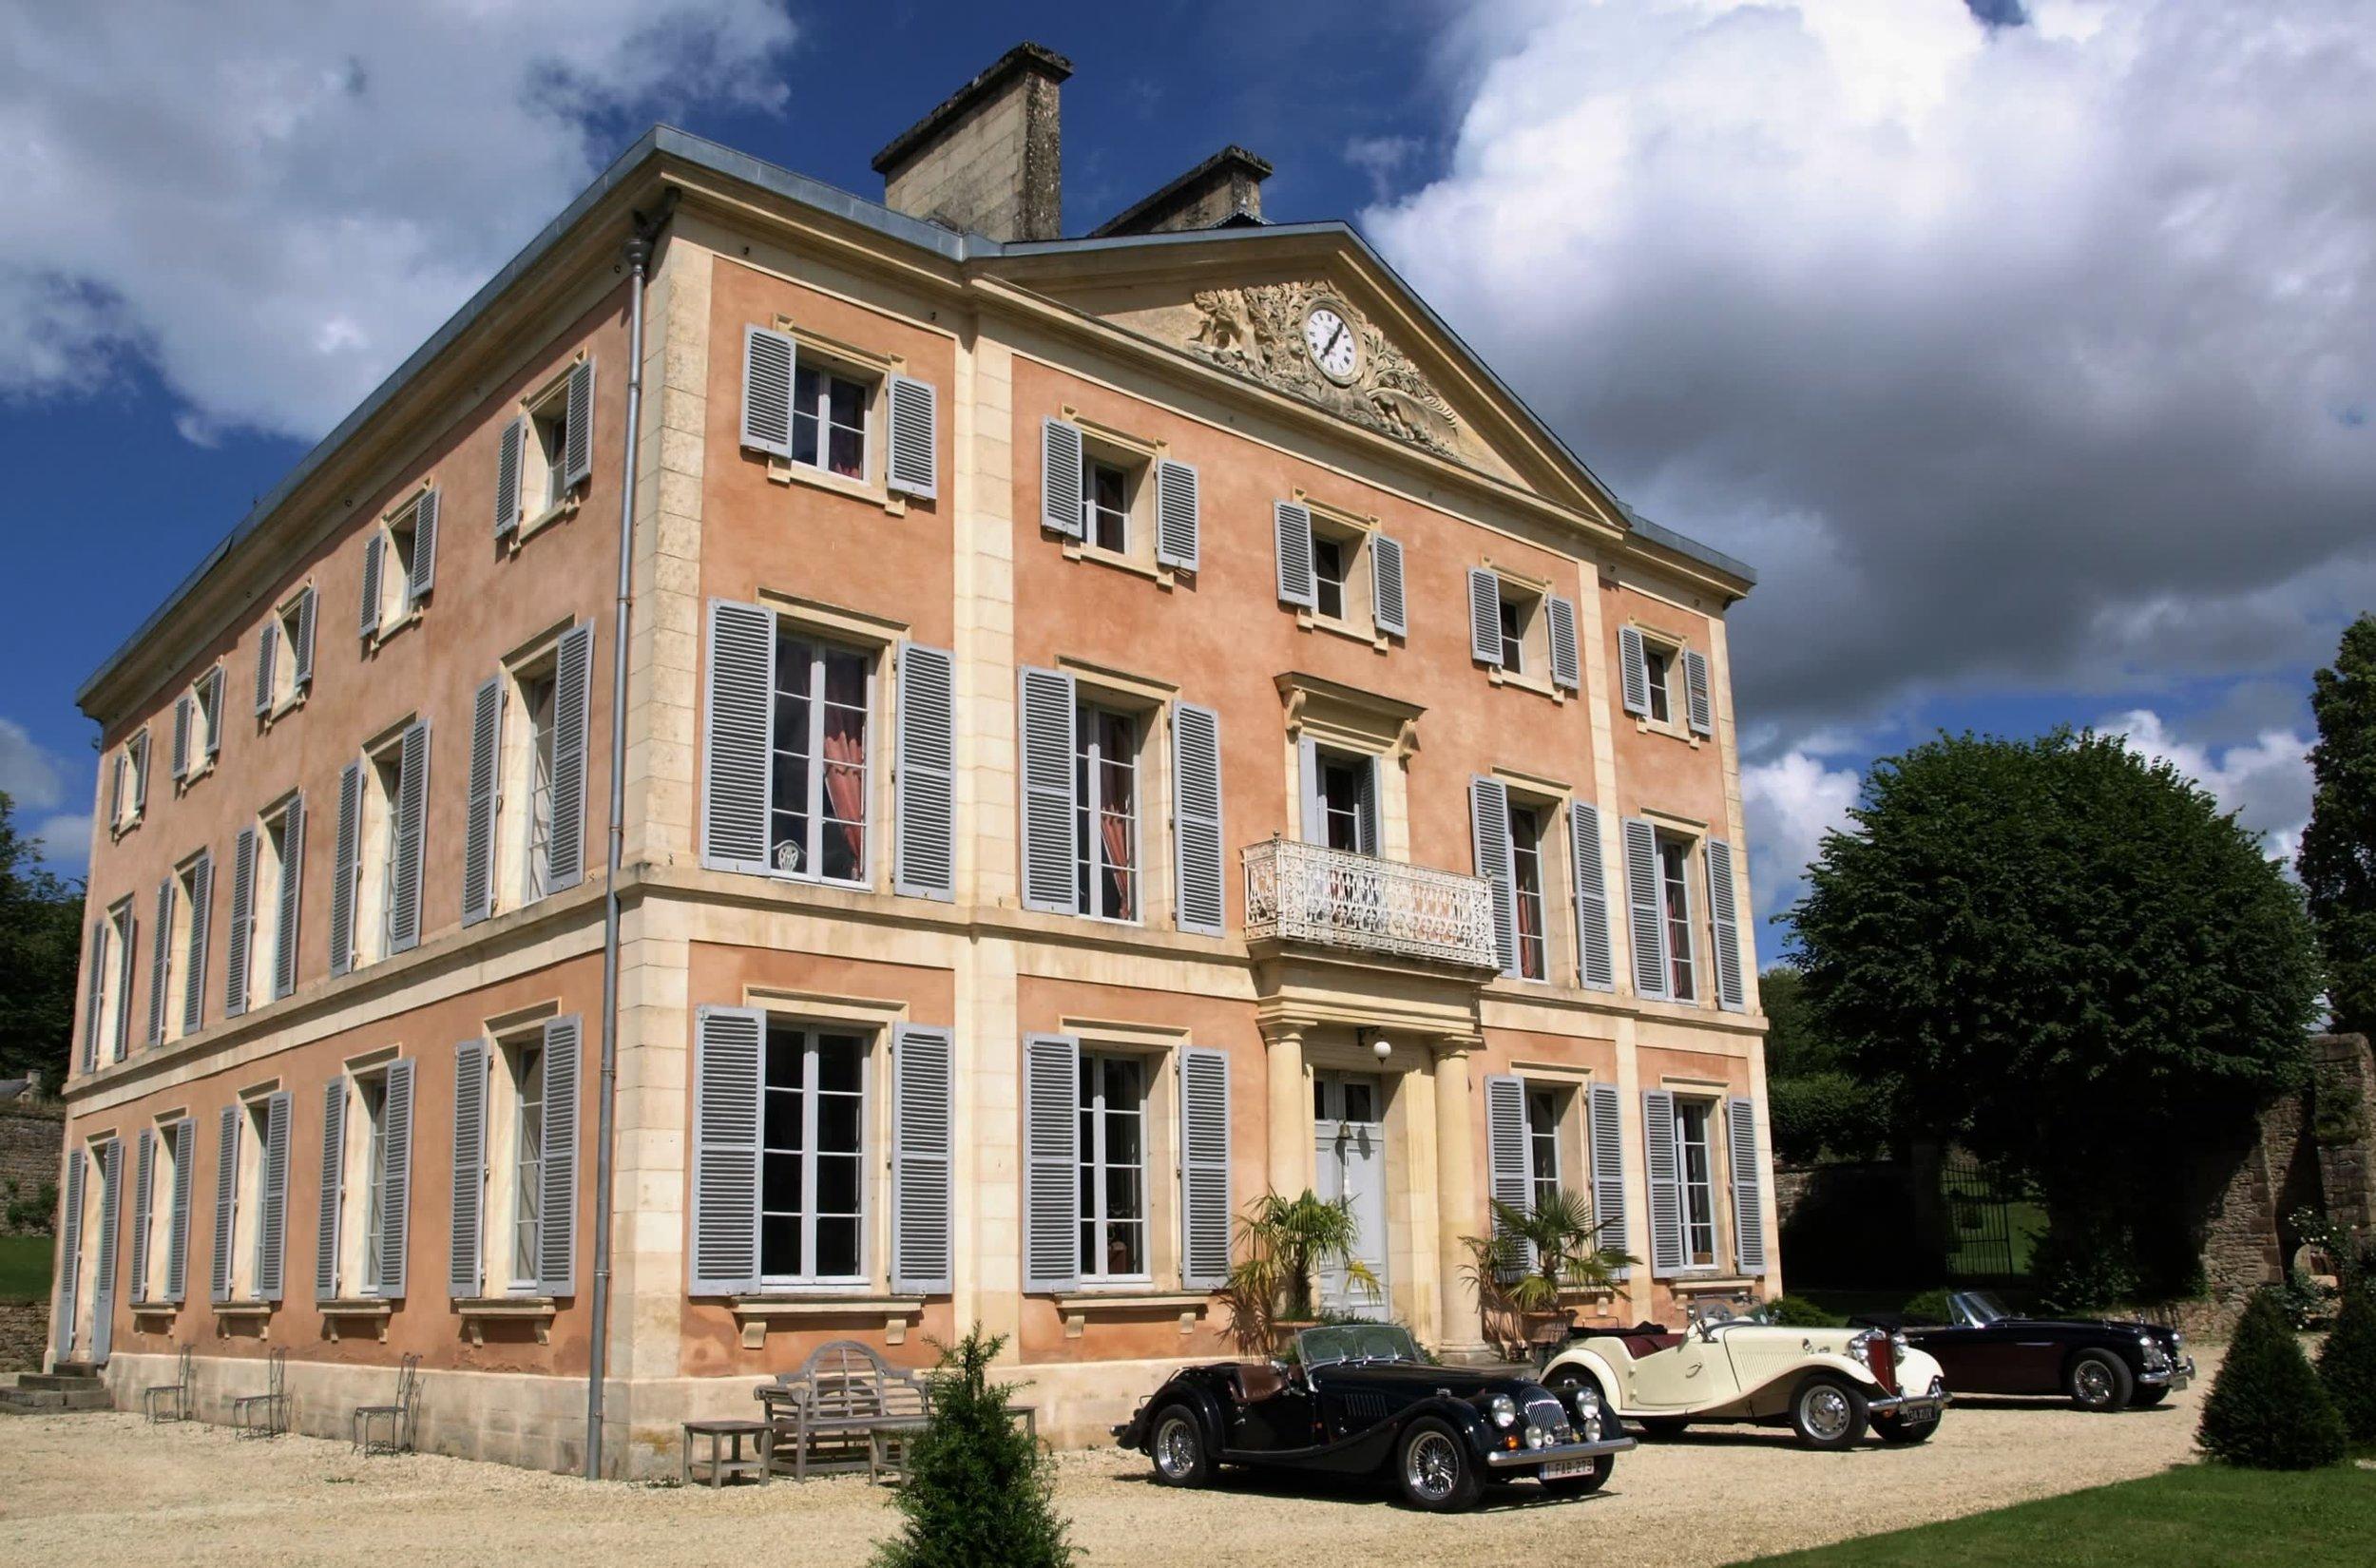 Chateau de la Pommeraye - charming boutique hotel chateau b&b spa normandy calvados 7(2).jpg